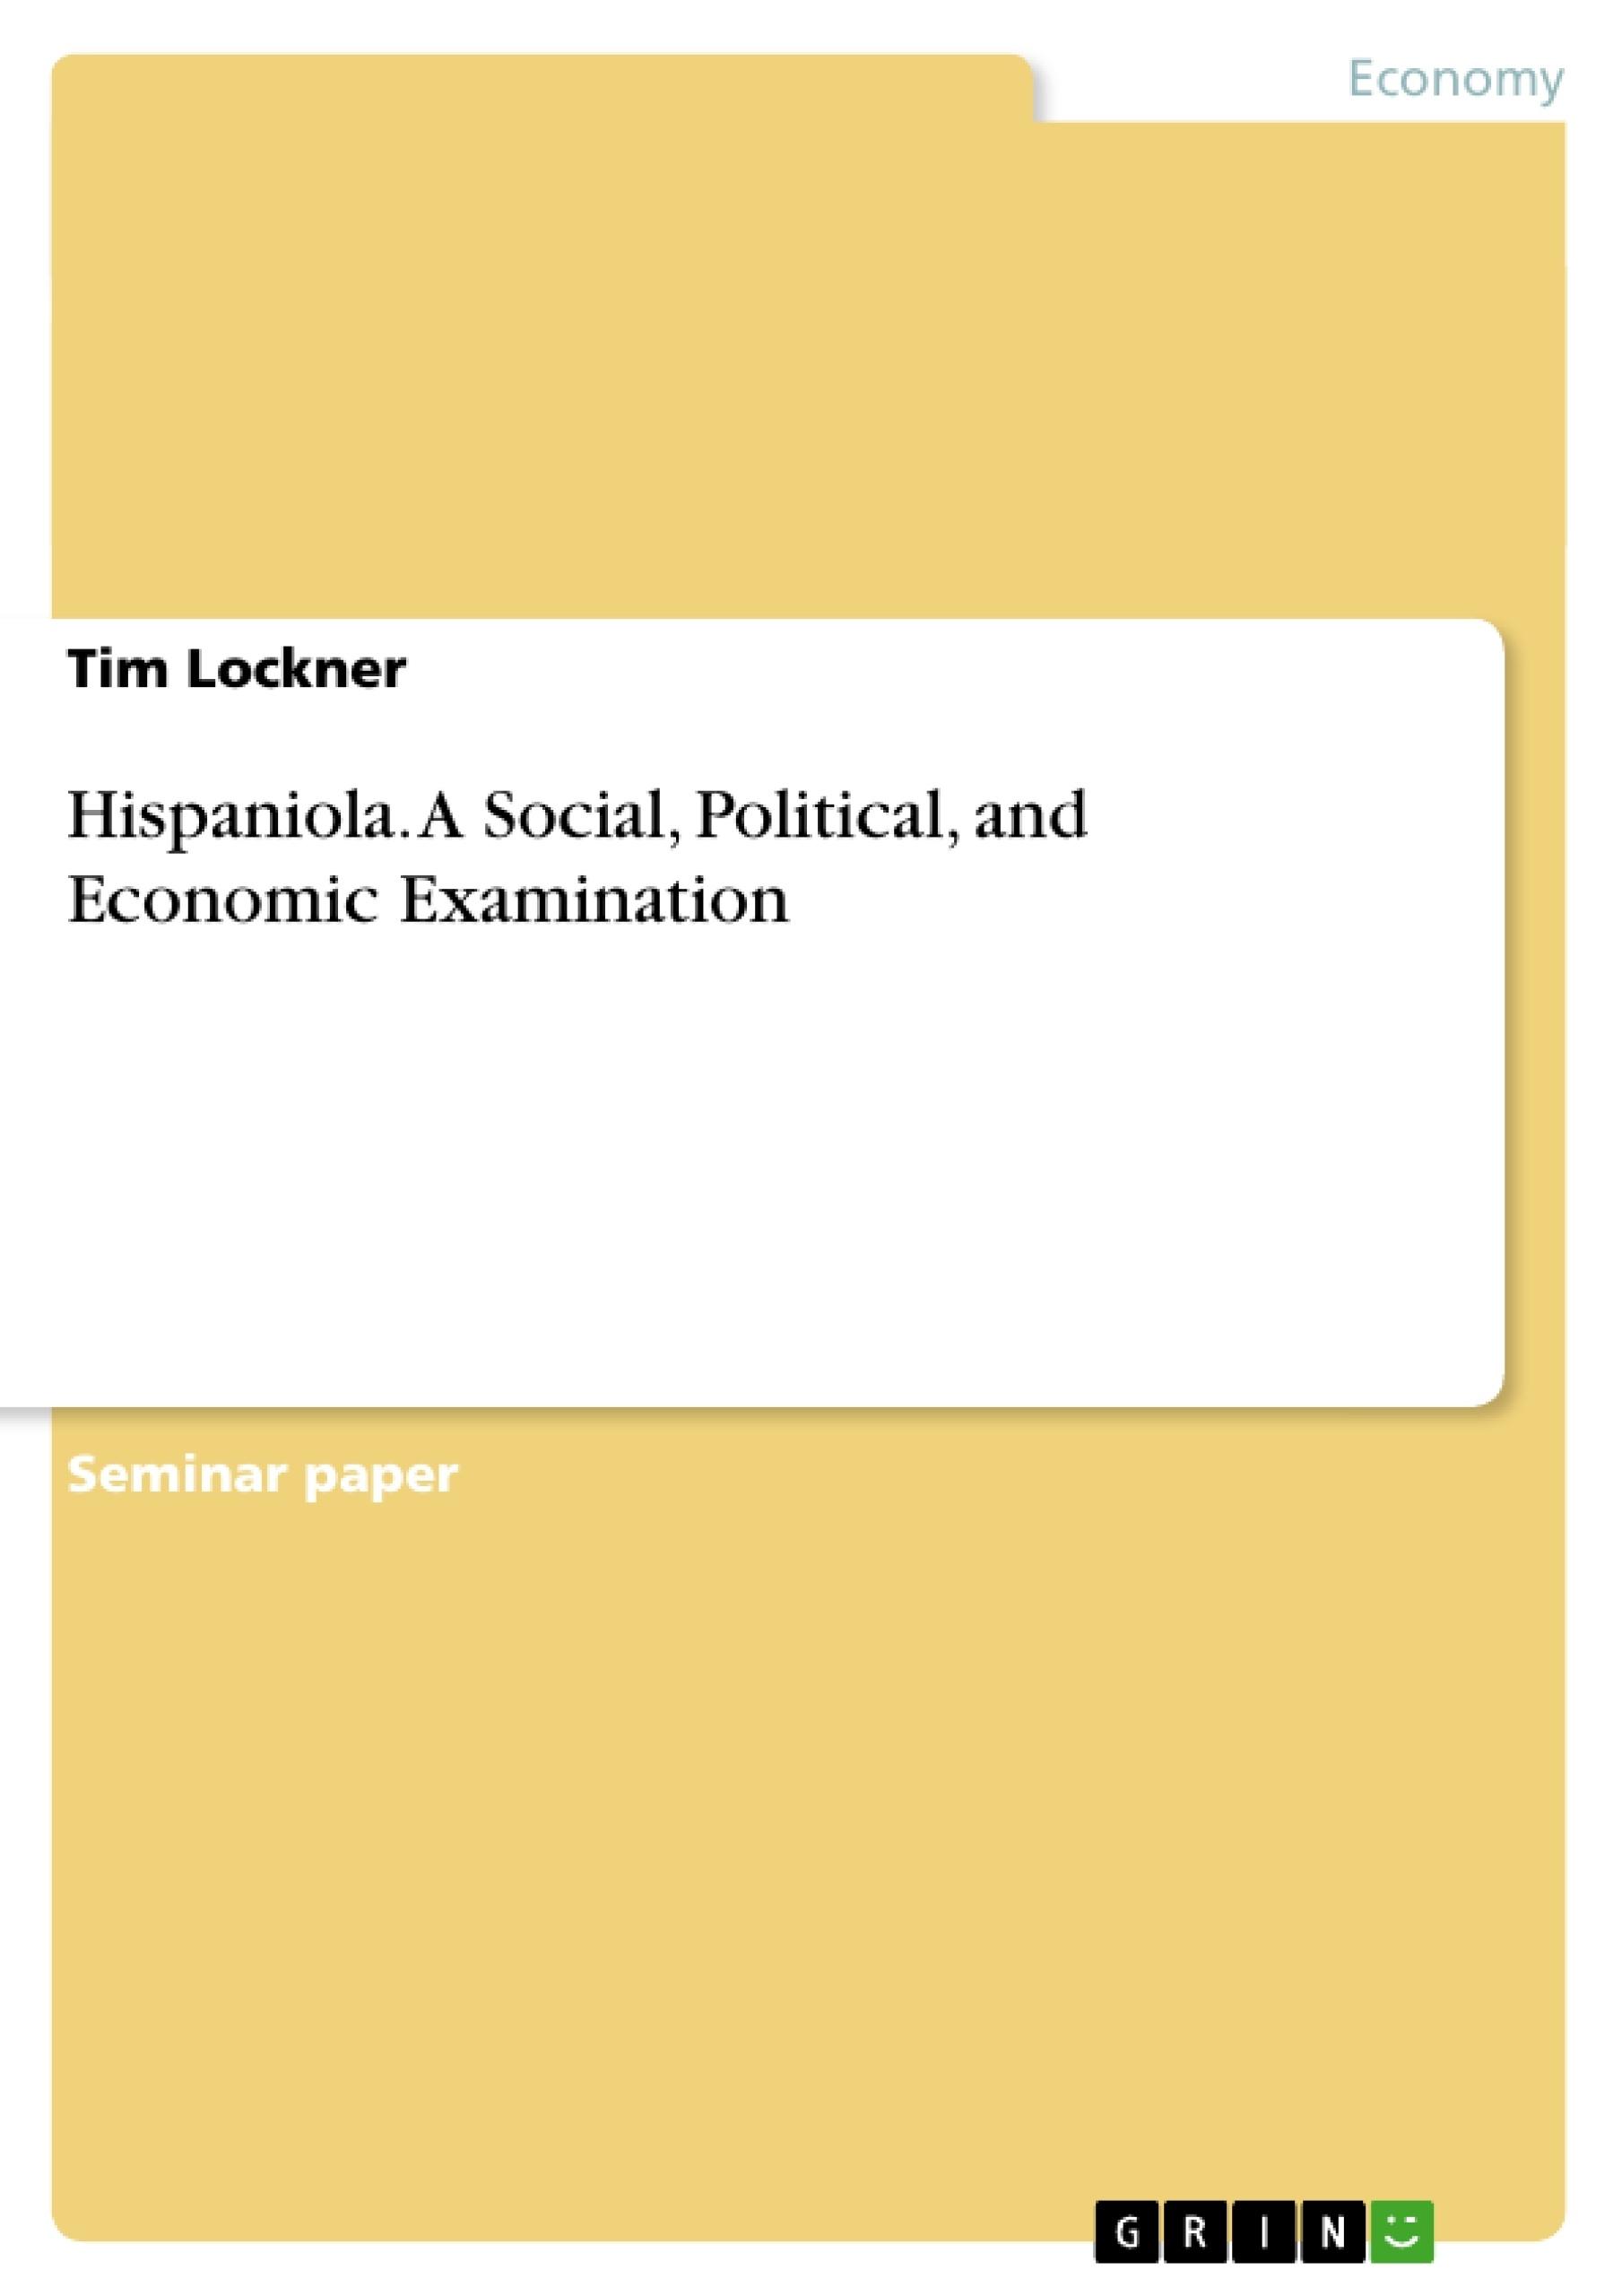 Title: Hispaniola. A Social, Political, and Economic Examination